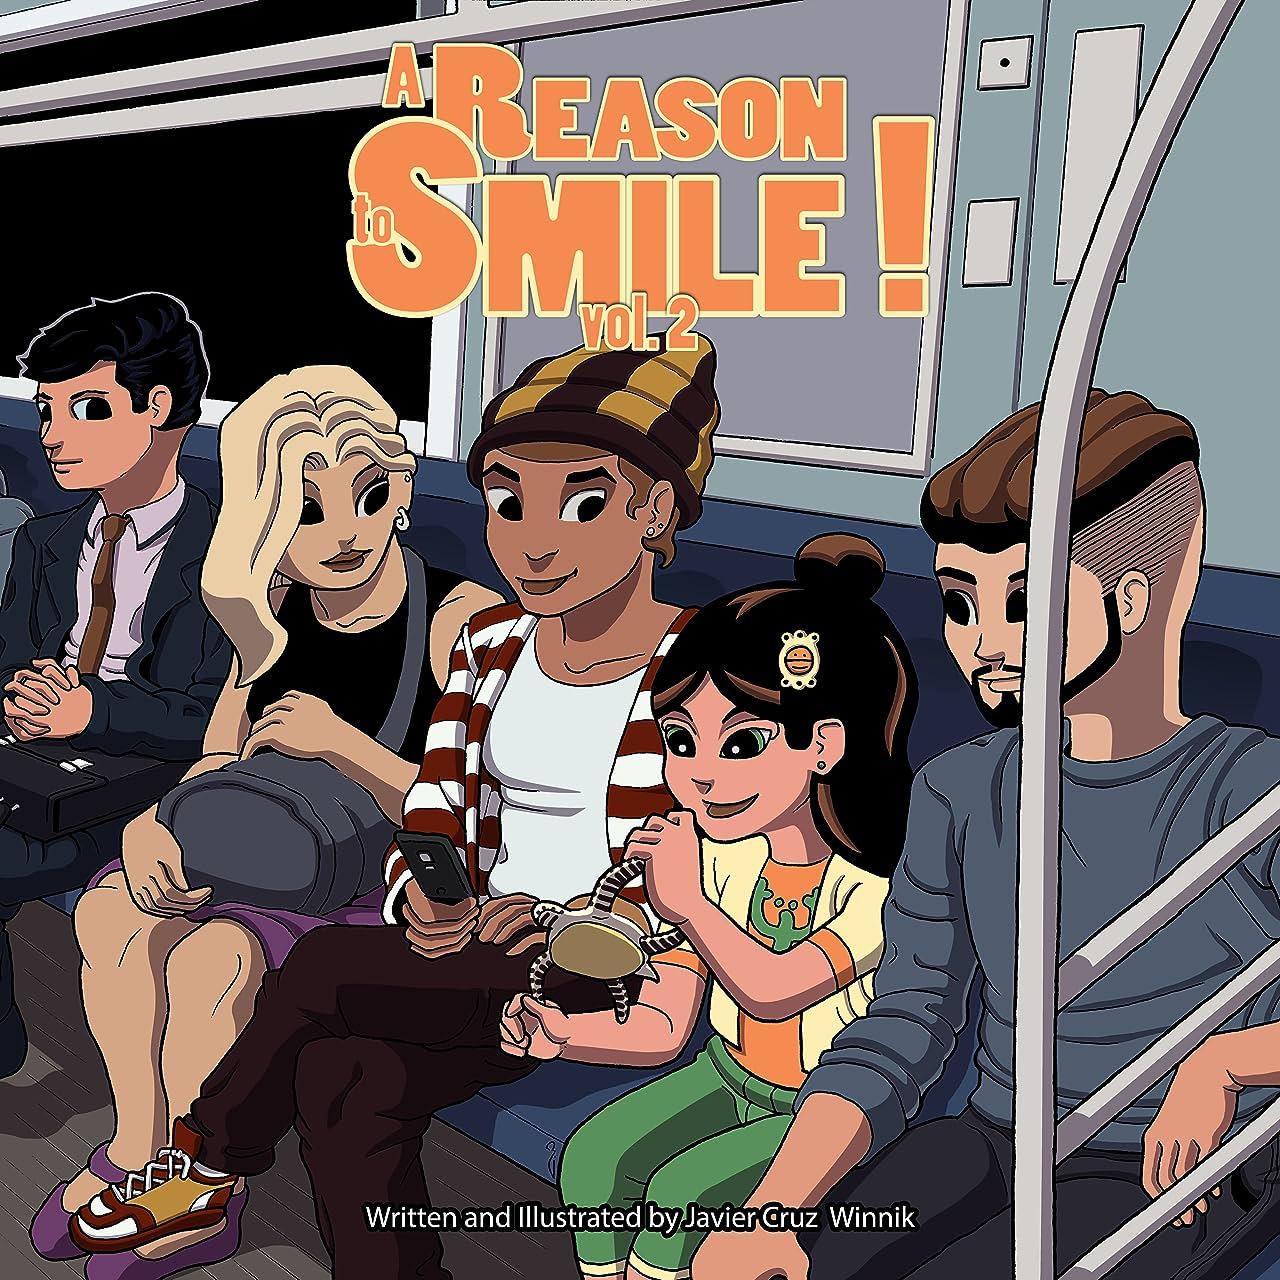 A Reason to Smile! Vol. 2